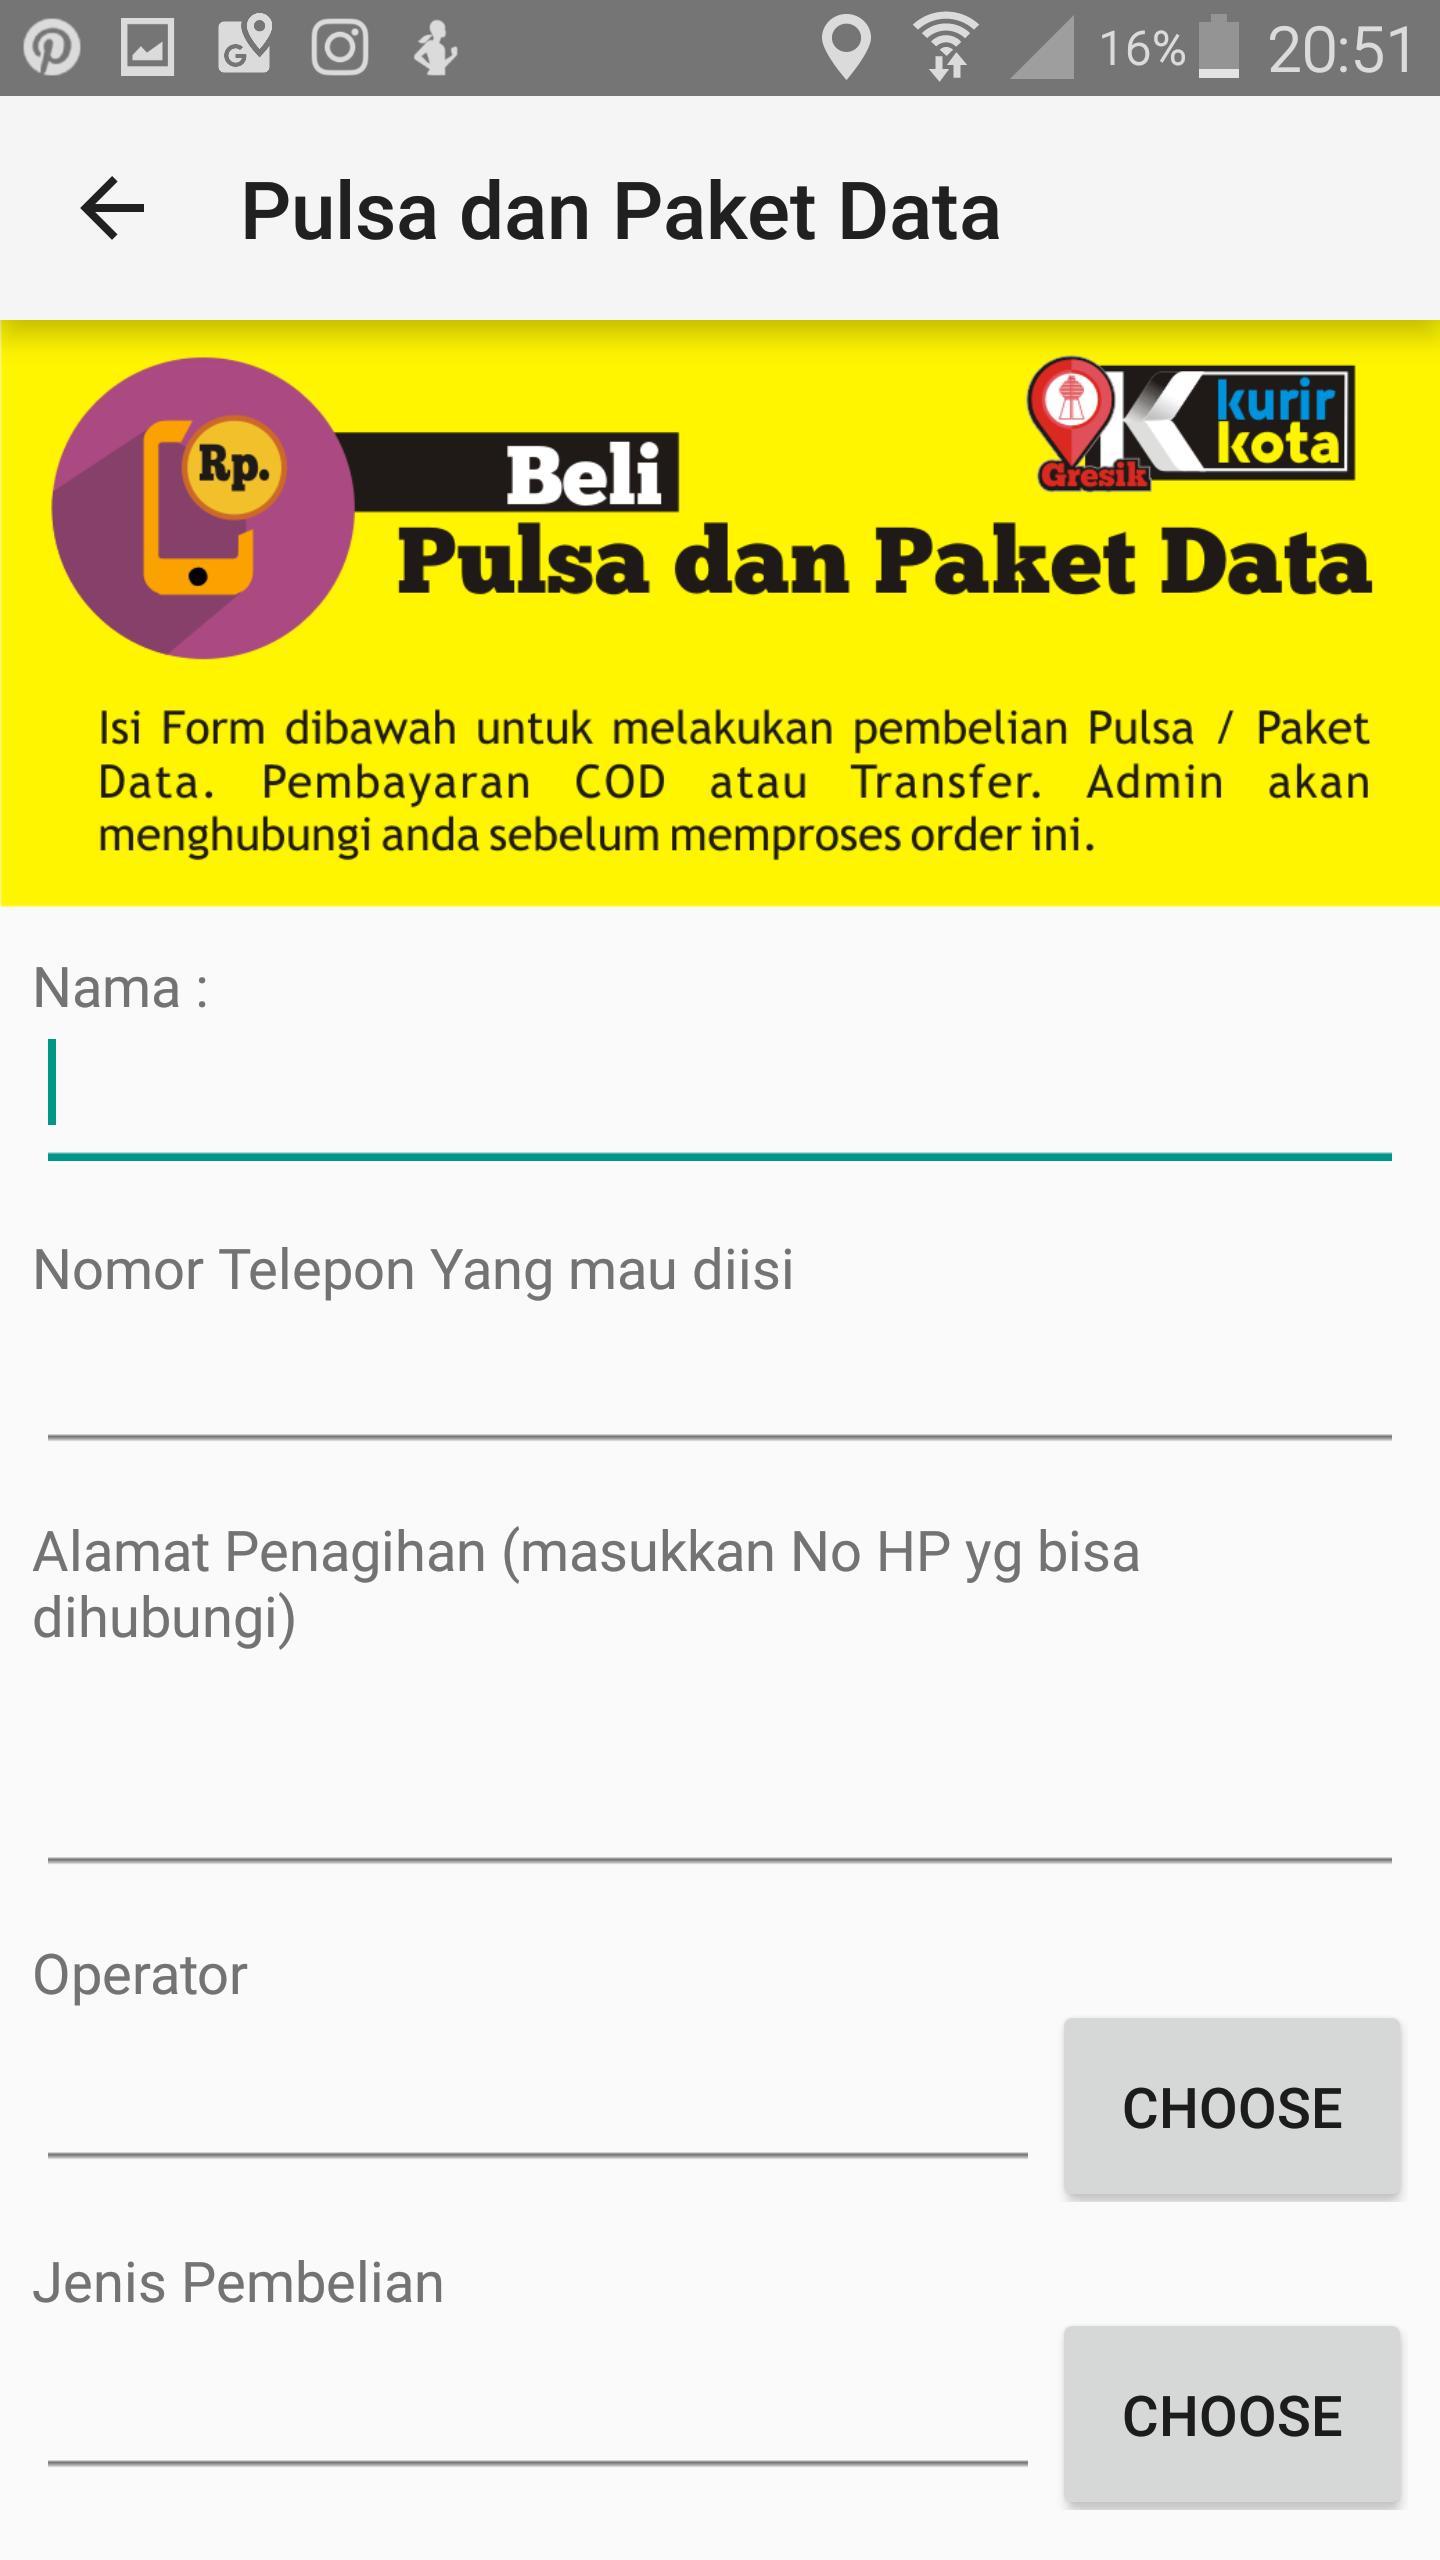 Kurir Kota Gresik For Android Apk Download